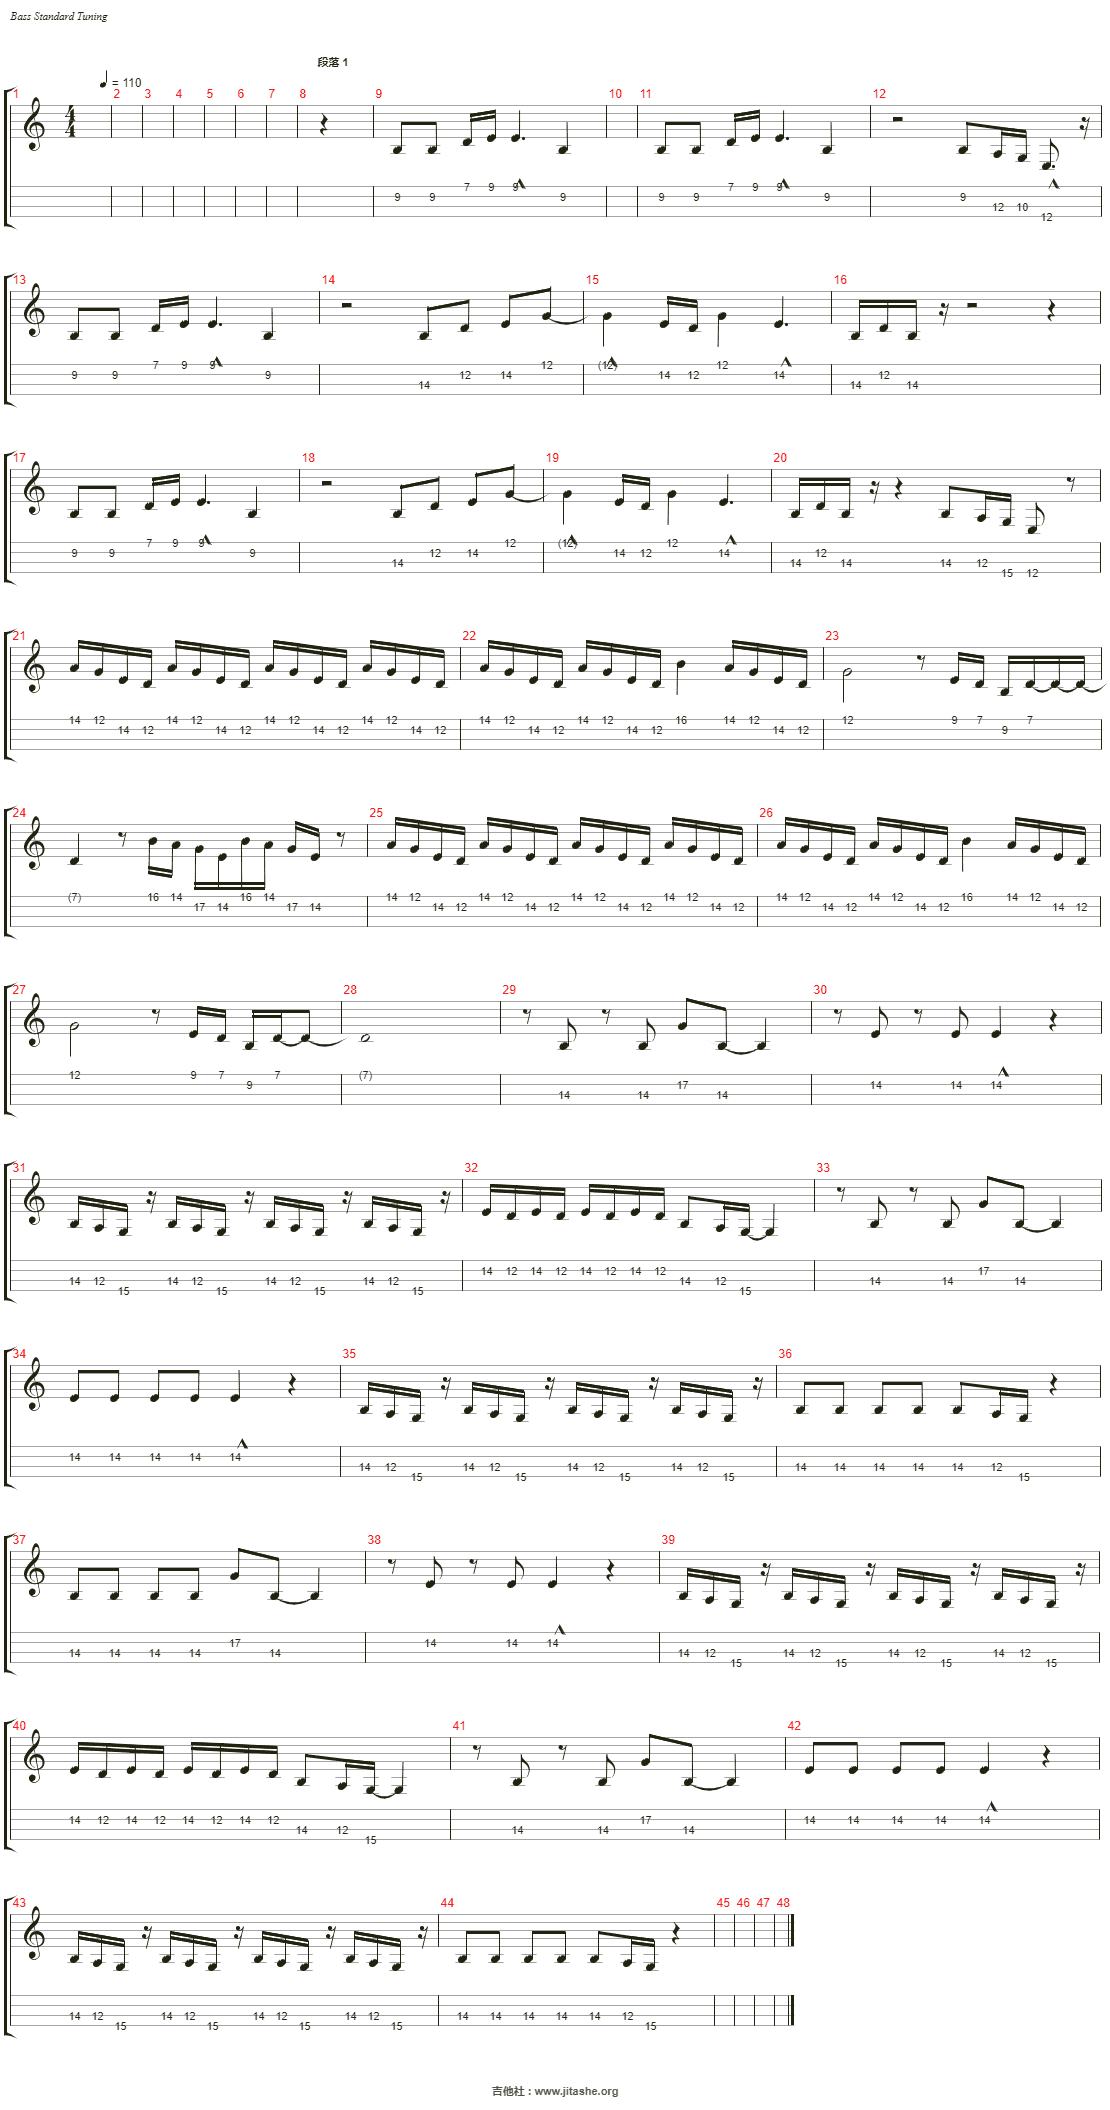 Time吉他谱(音轨 1)_MKJ